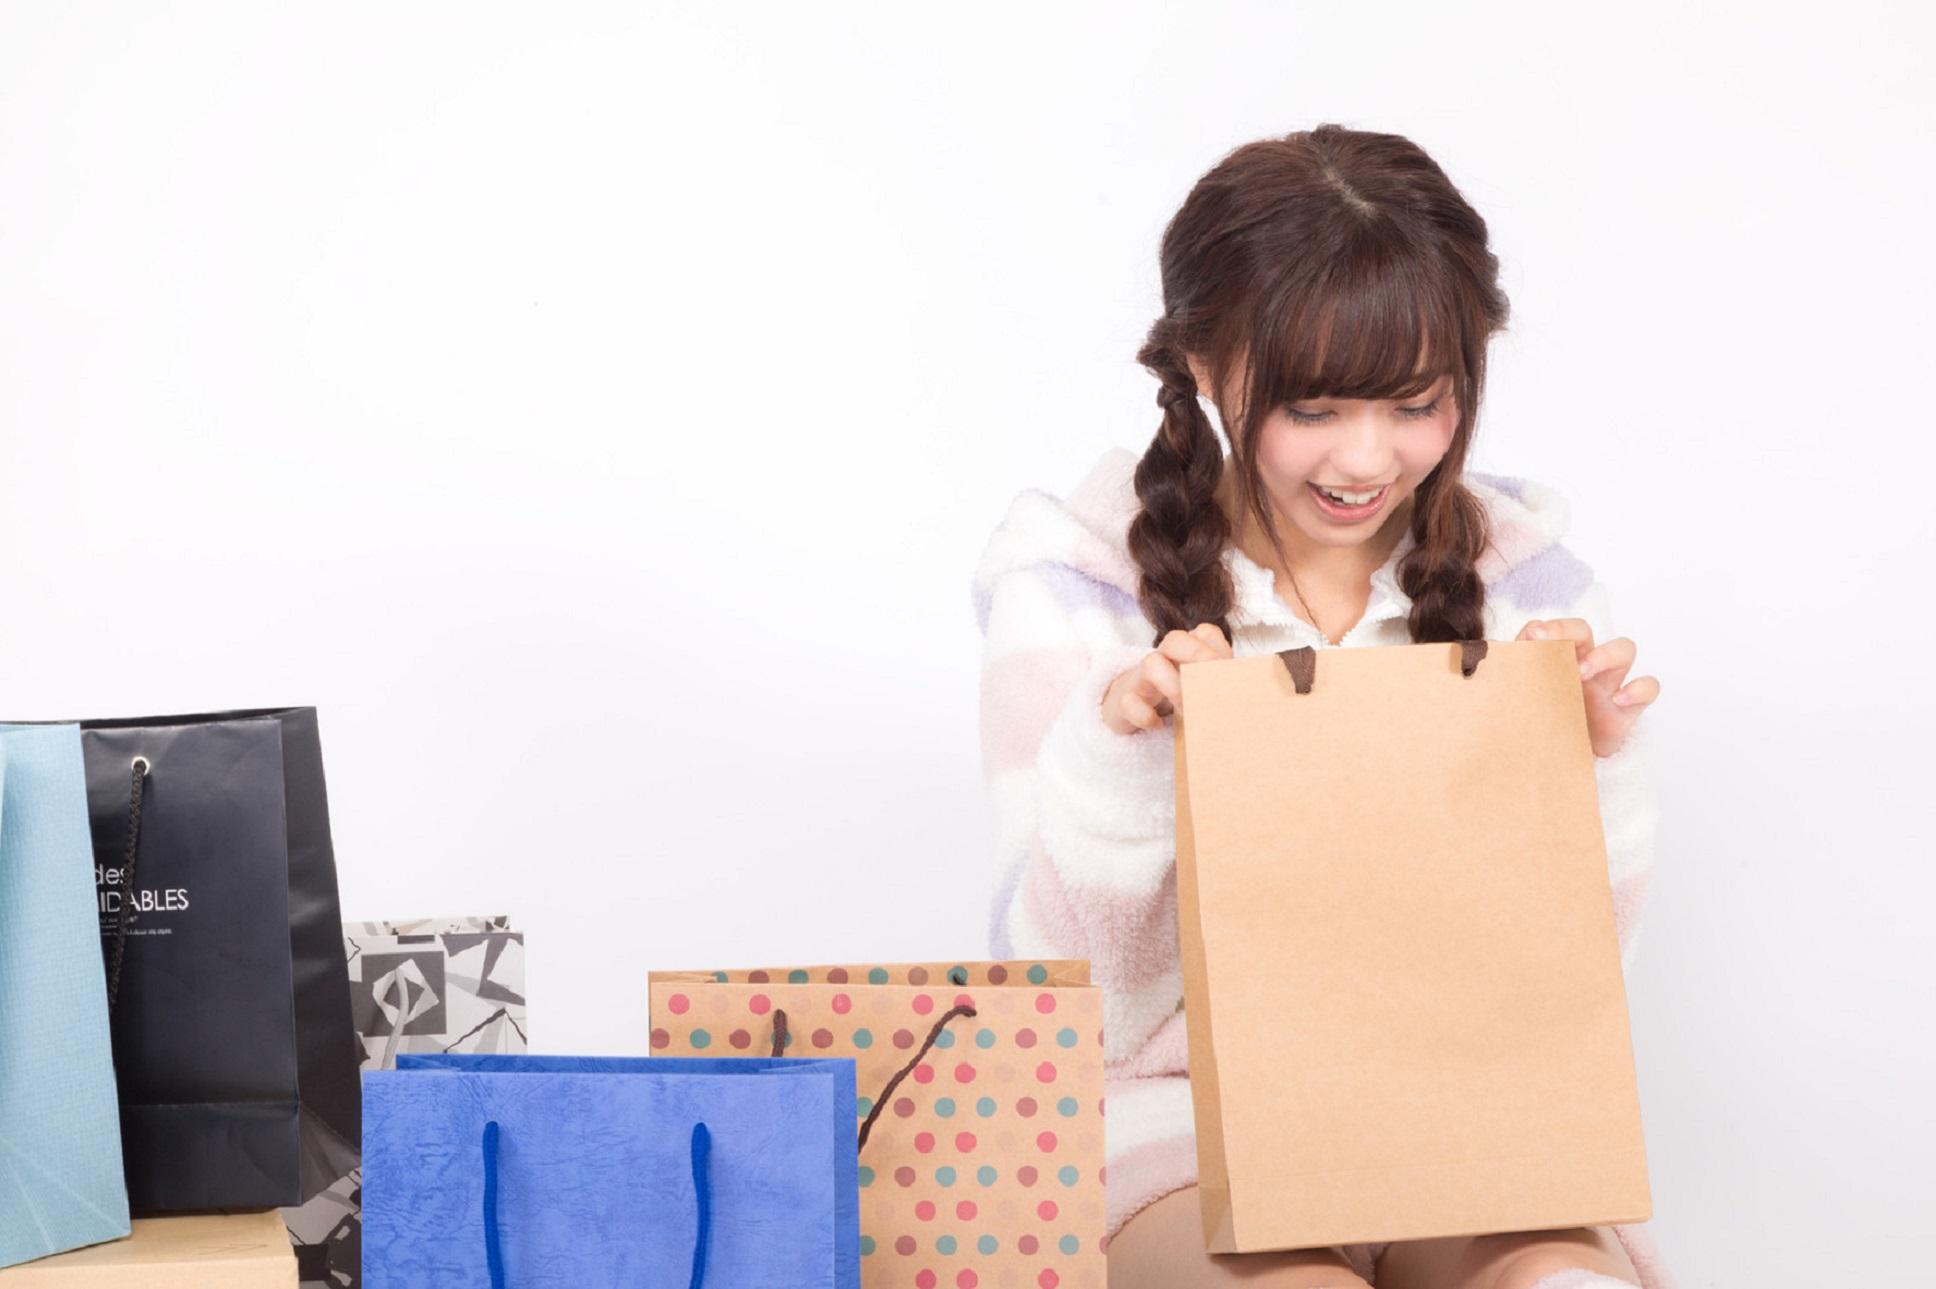 HOW TO プレゼント選び!友達が欲しいものを自然に探る方法